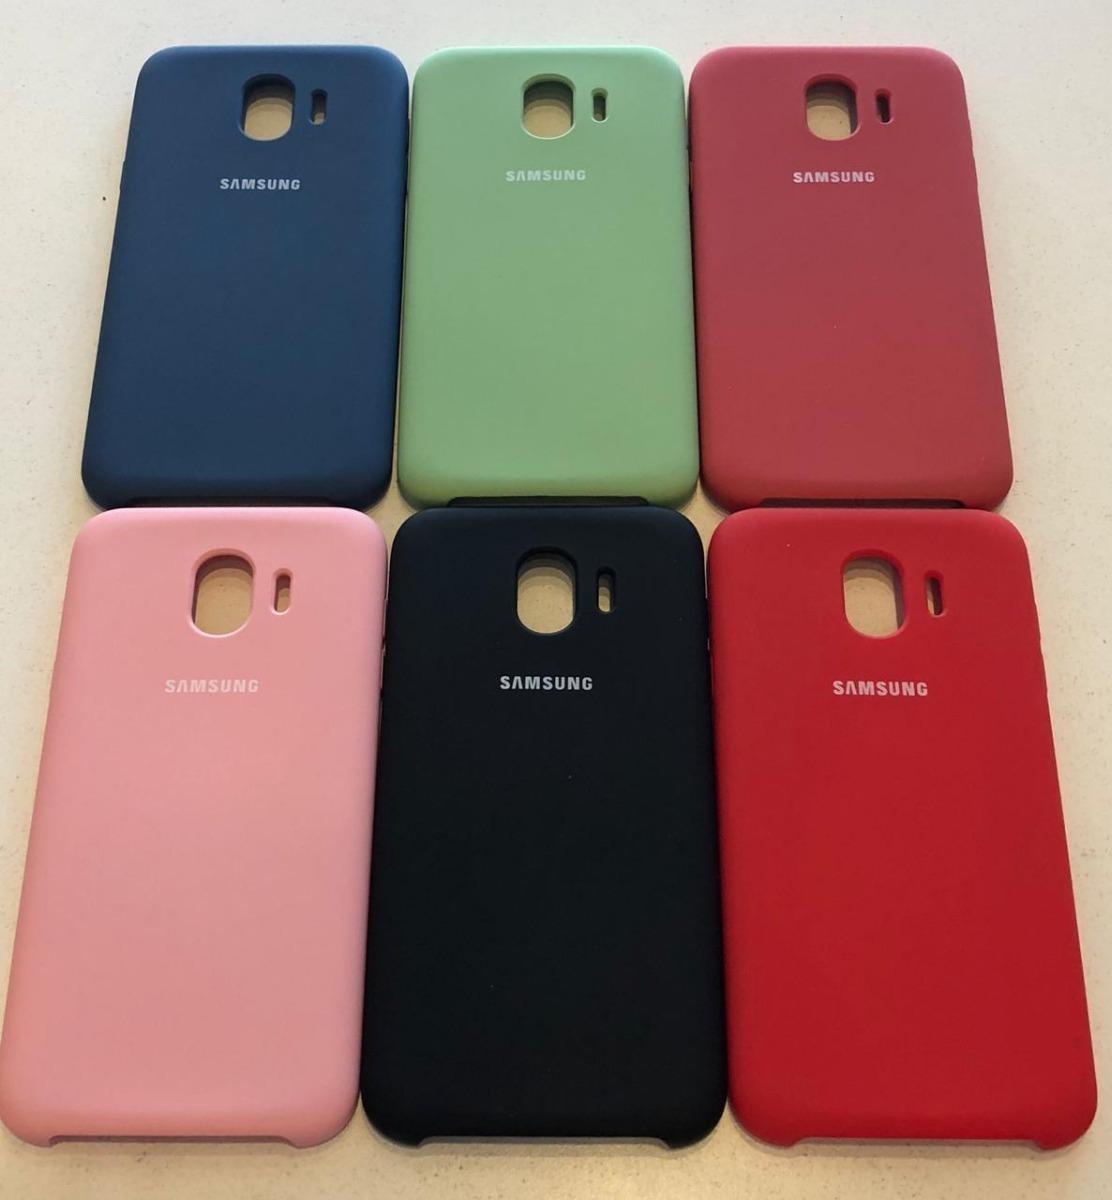 904c5dcddd1 Stuche Silicone Case Para Samsung J4 / J6 / J8 - $ 21.900 en Mercado ...